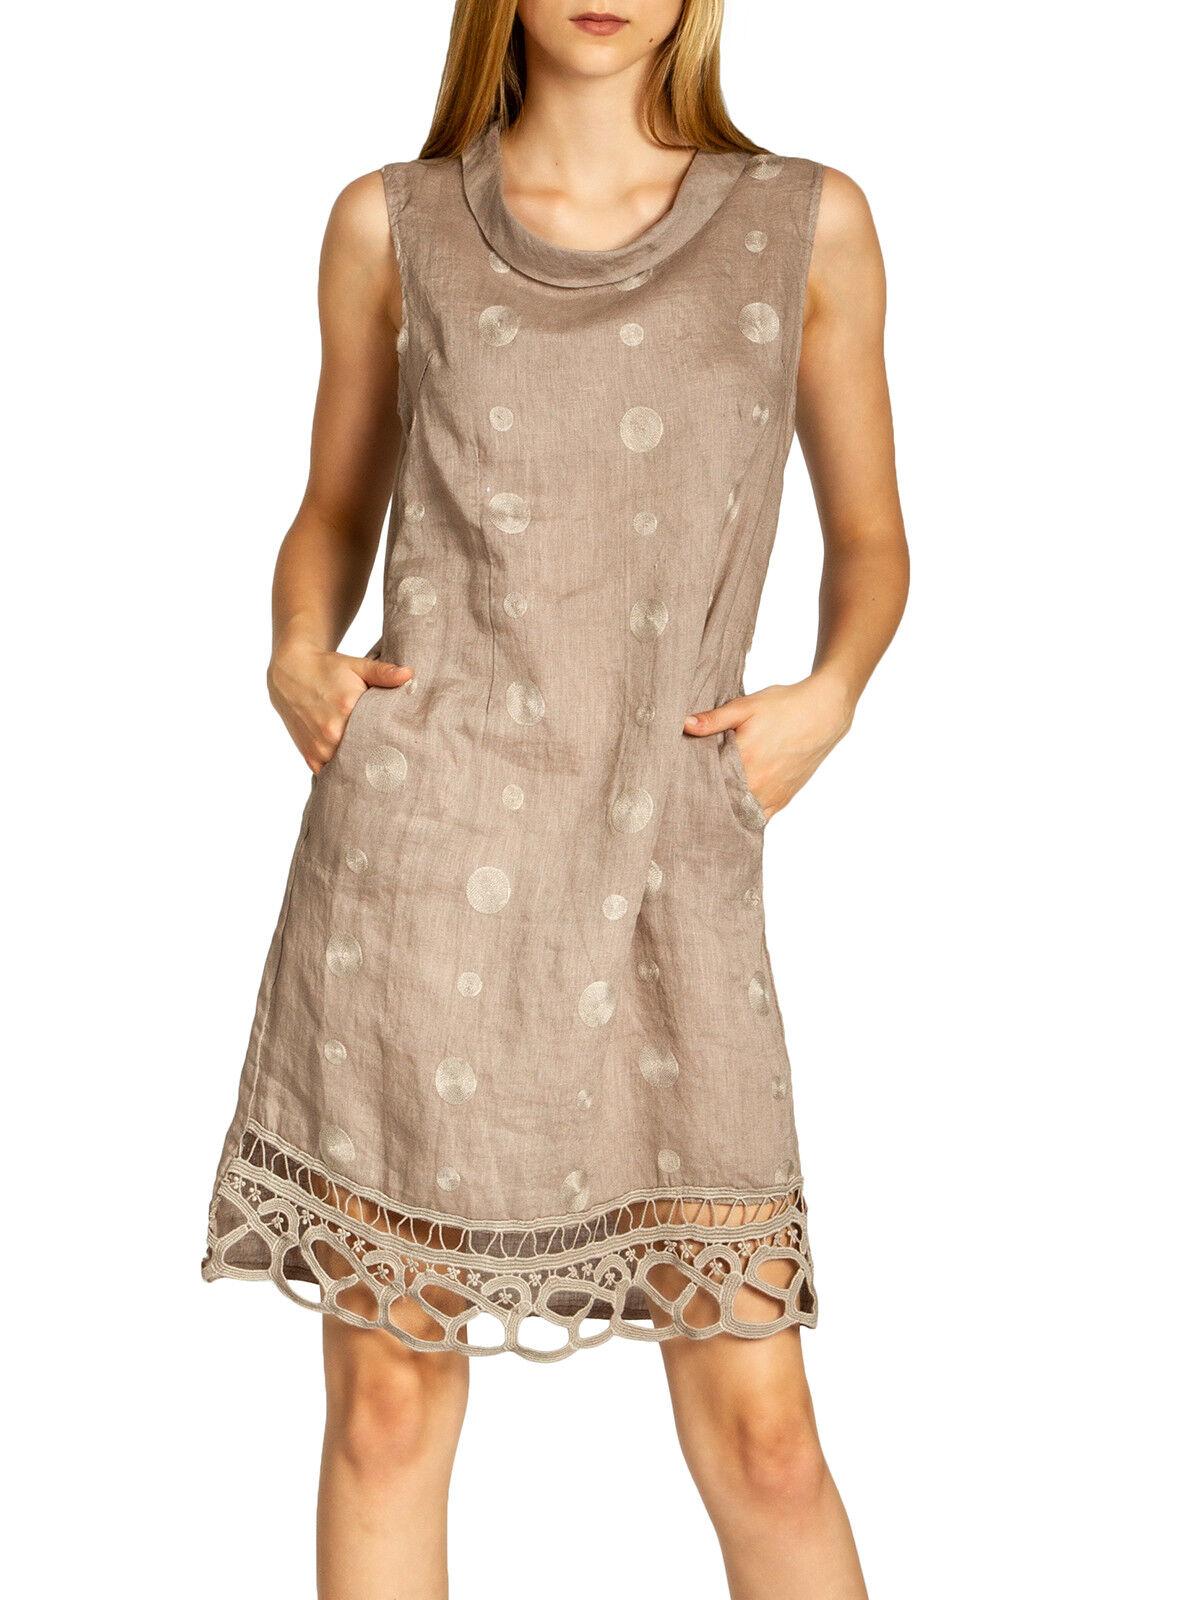 CASPAR SKL019 Damen Sommer Kleid Leinenkleid knielang elegant Taupe XL 42 Braun